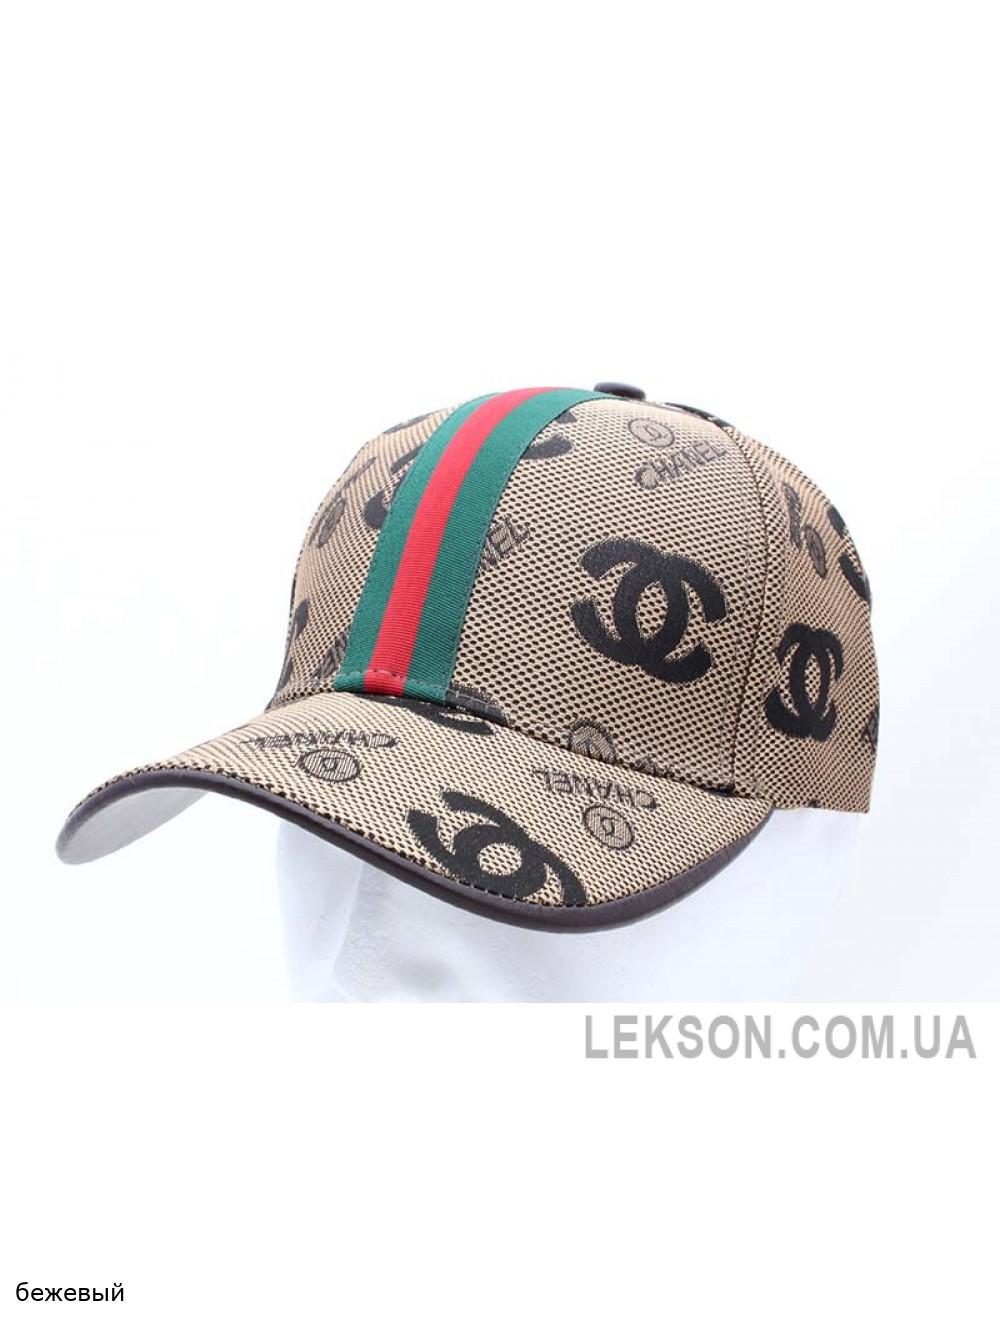 Brand - sp03030